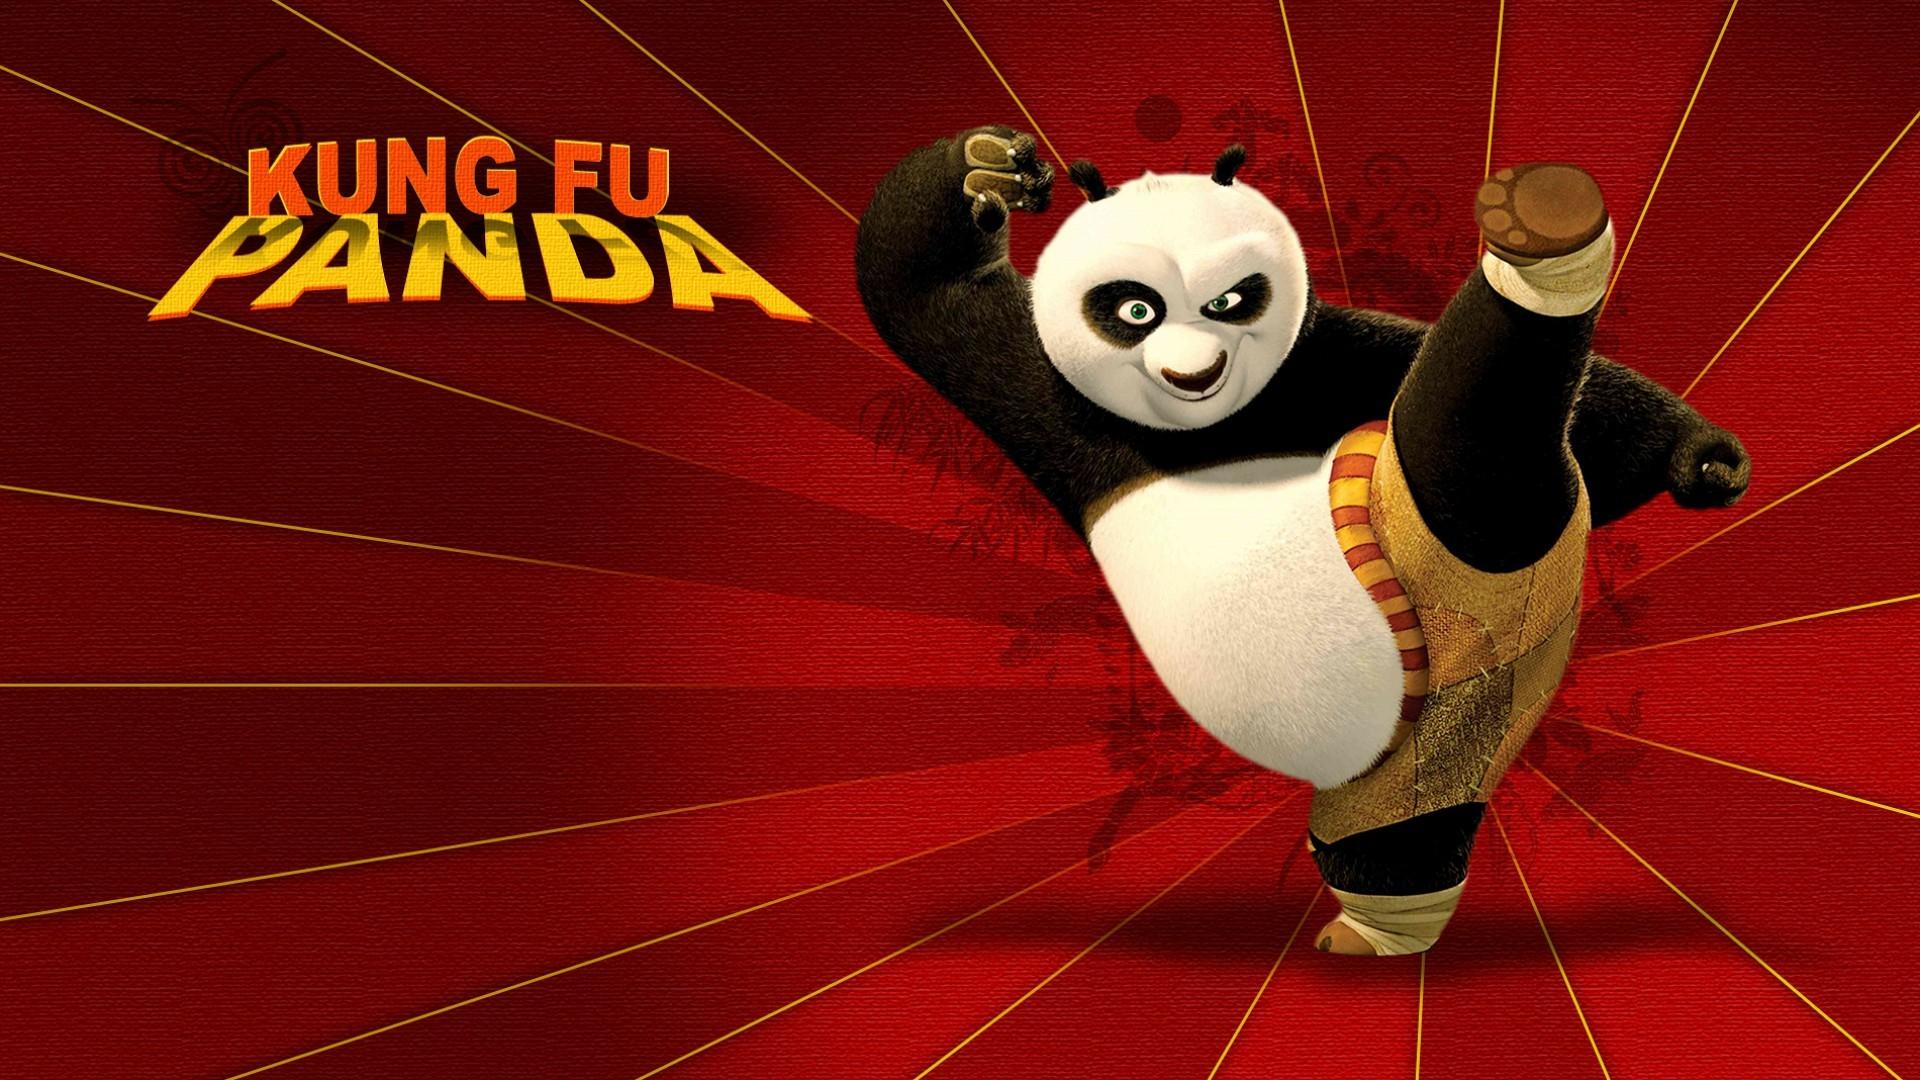 org/files/Anime_Animated/Kung Fu Panda HD wallpaper (